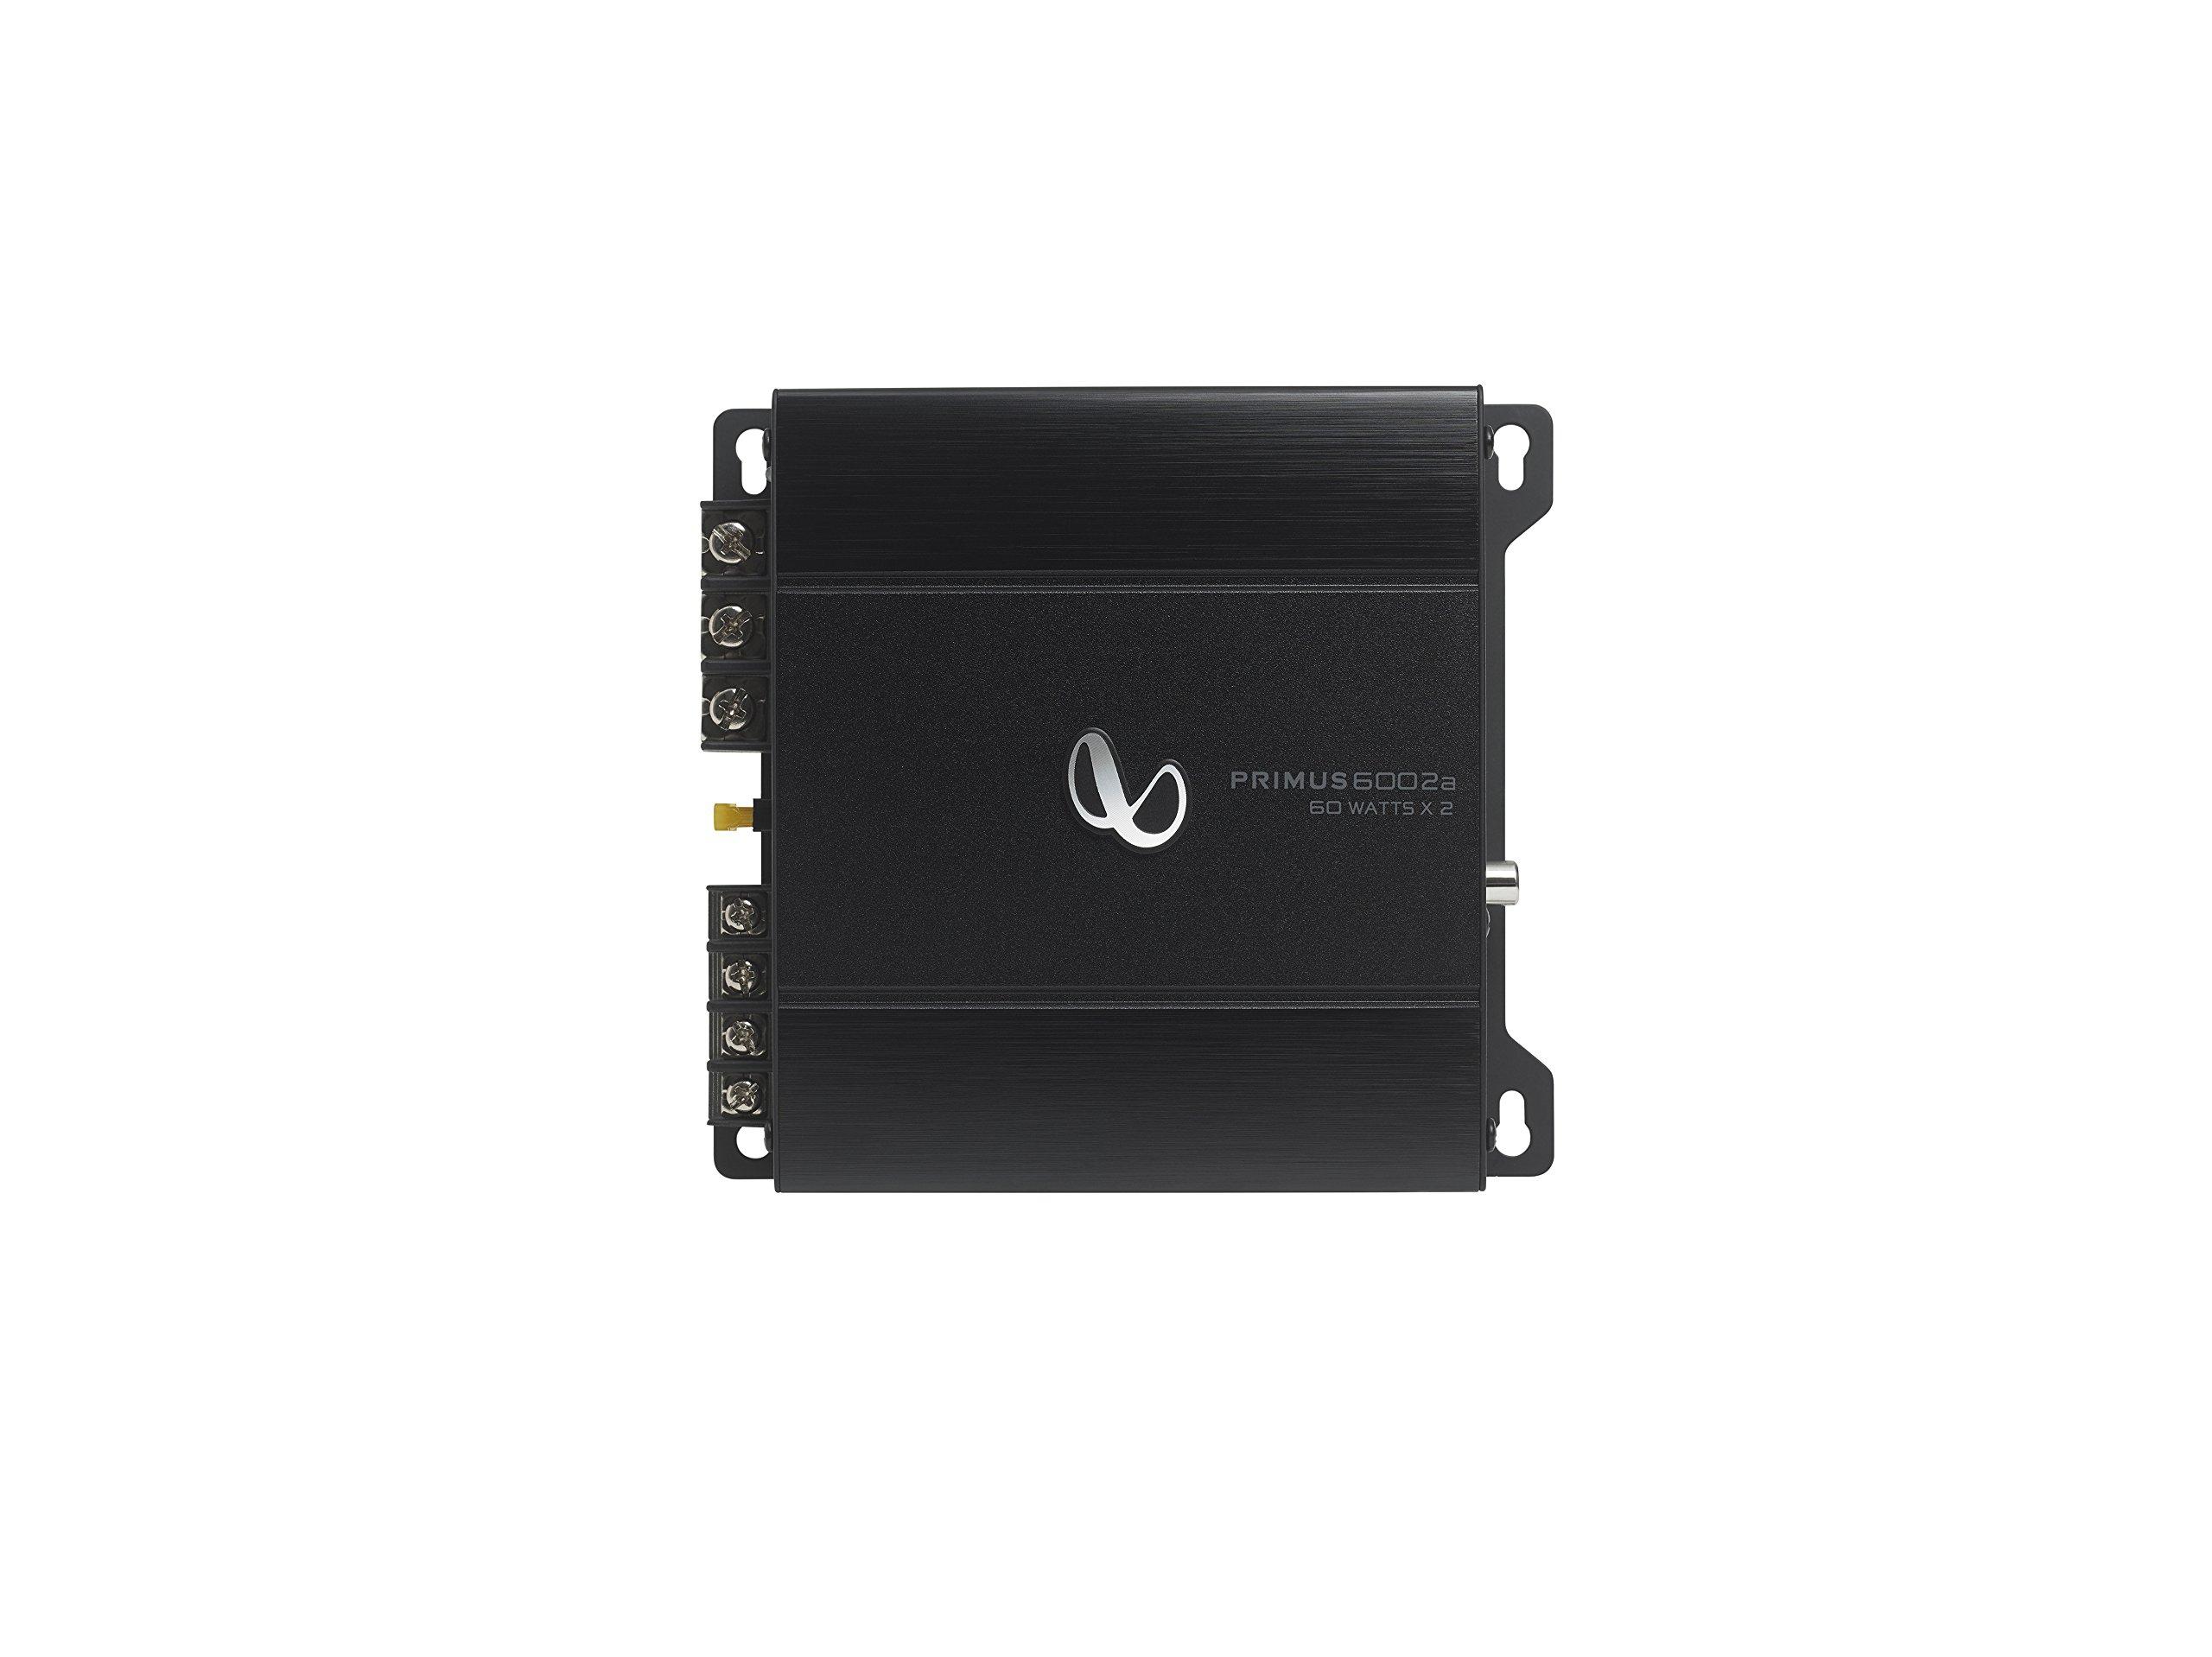 Infinity PRIMUS-6002A Primus 2-Channel, 50w X 2 amplifier